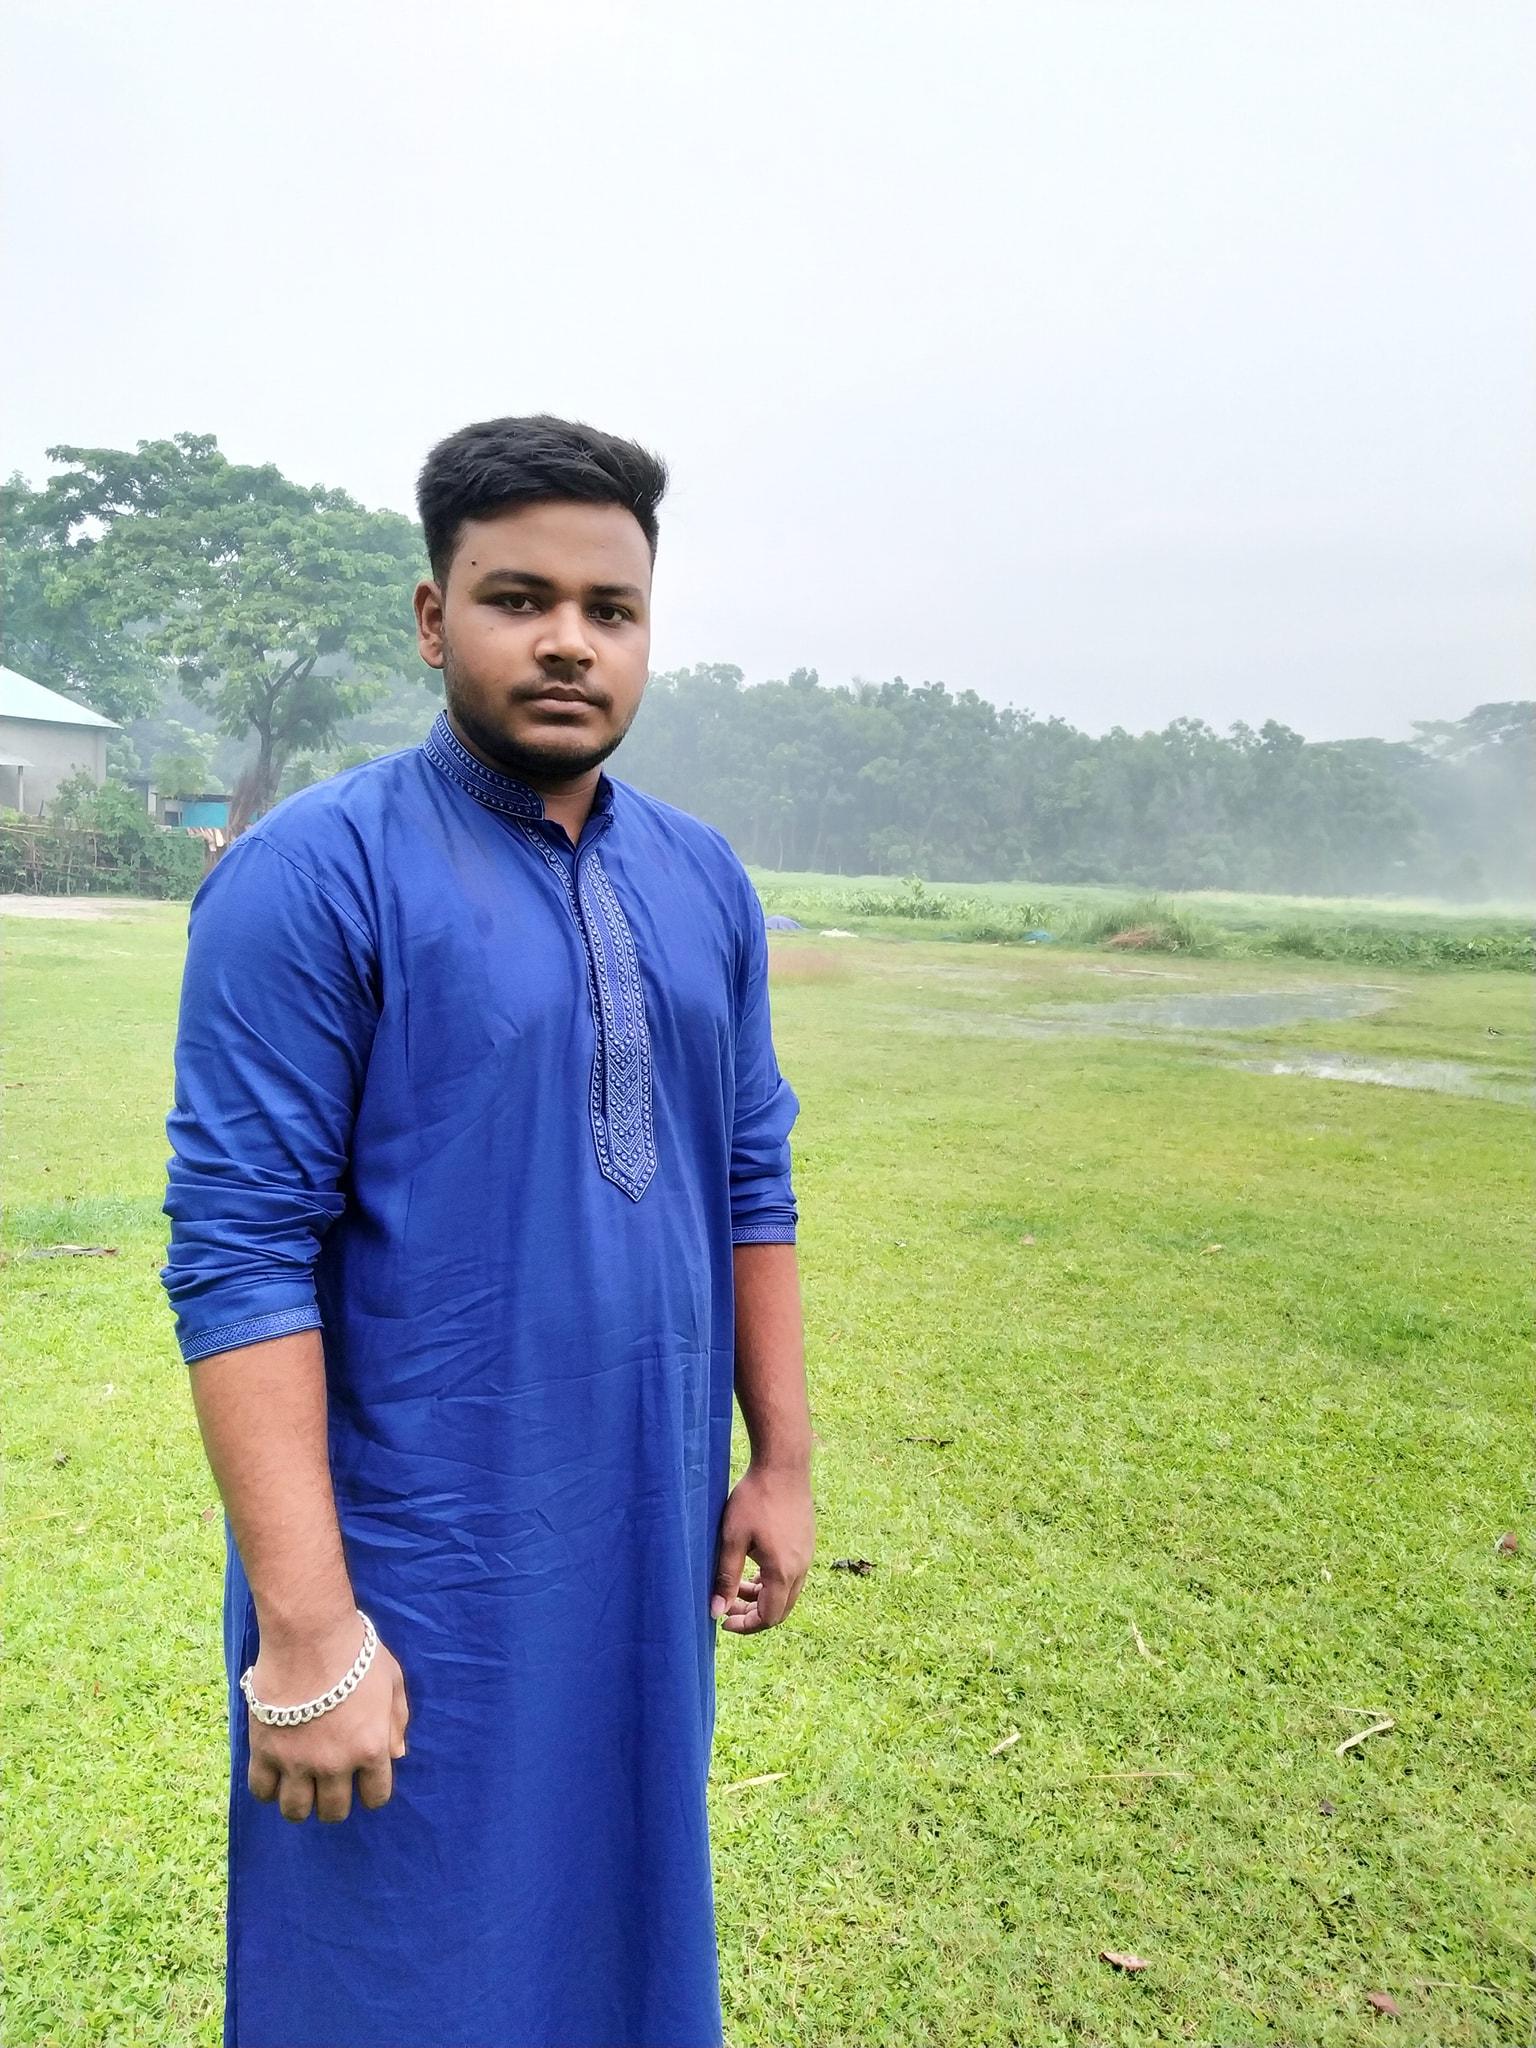 Shagor Bhuiya